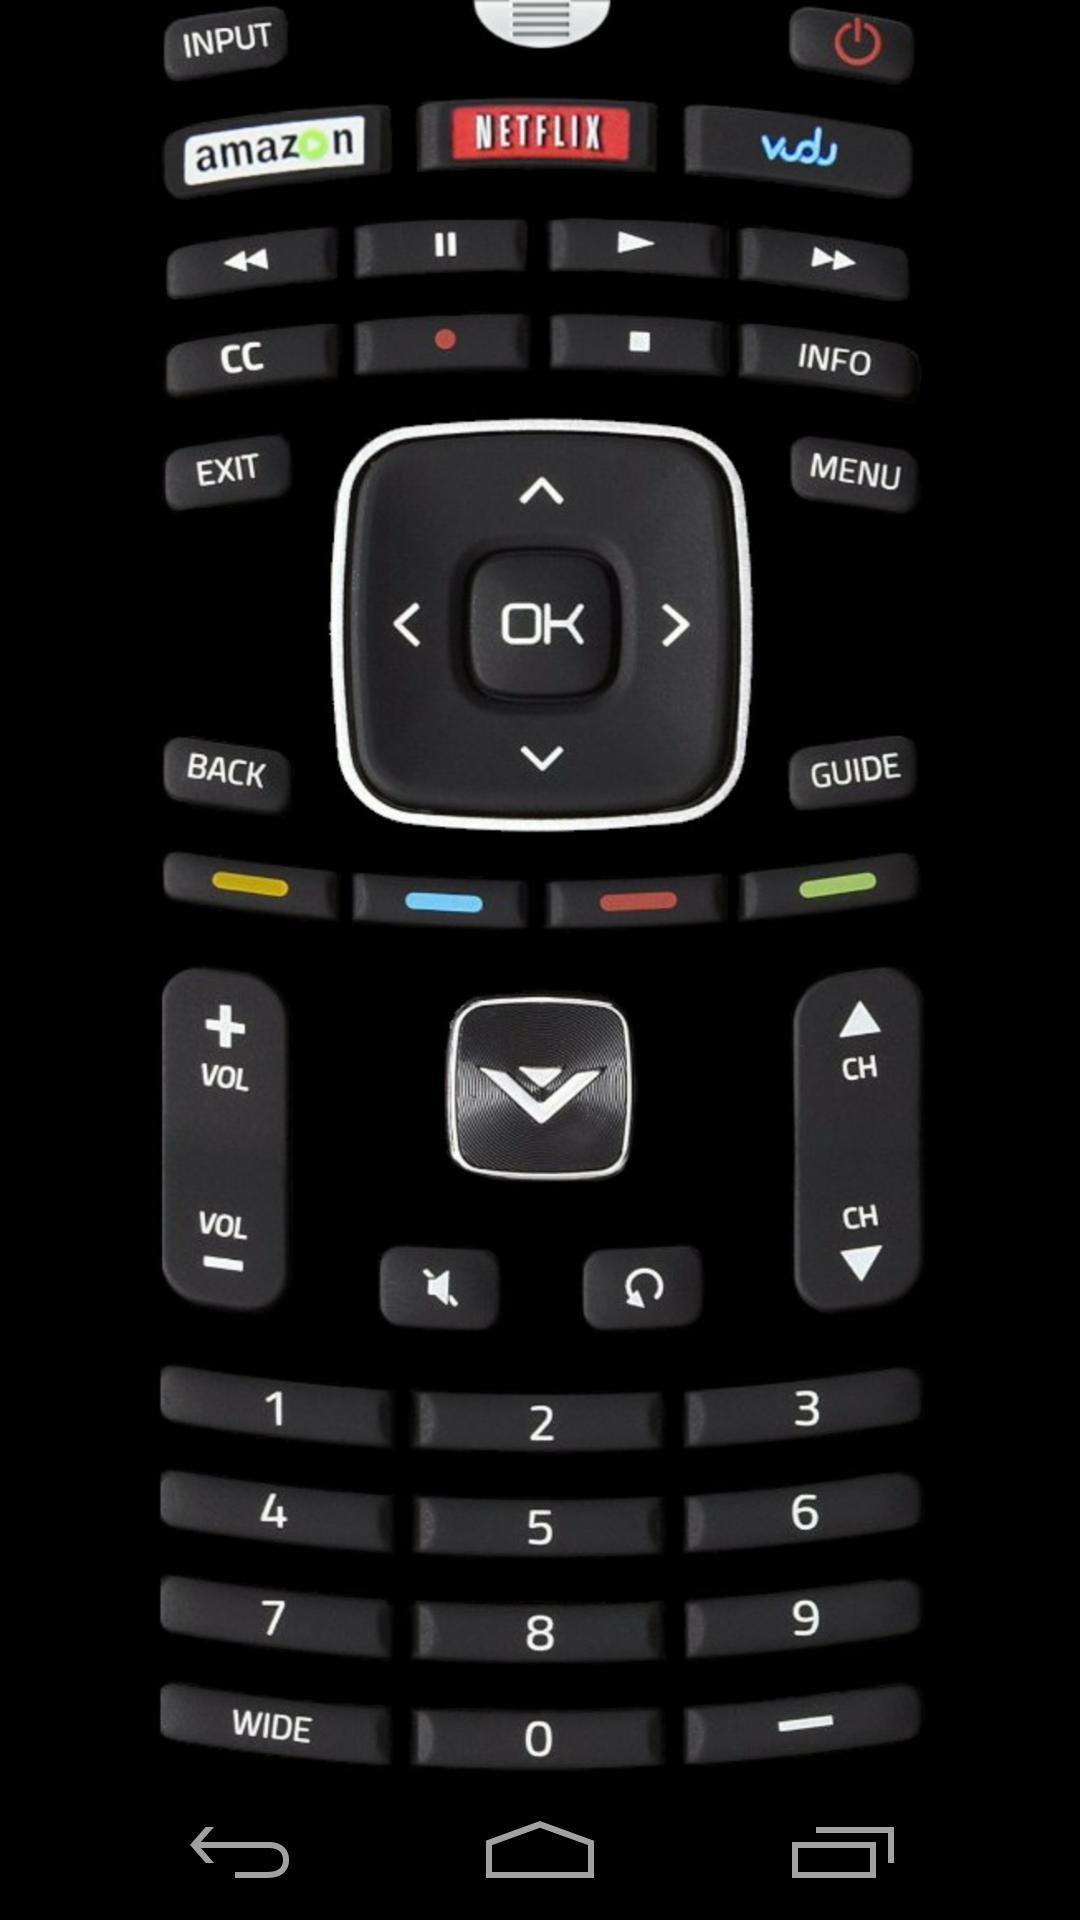 vizio smartcast apk free download